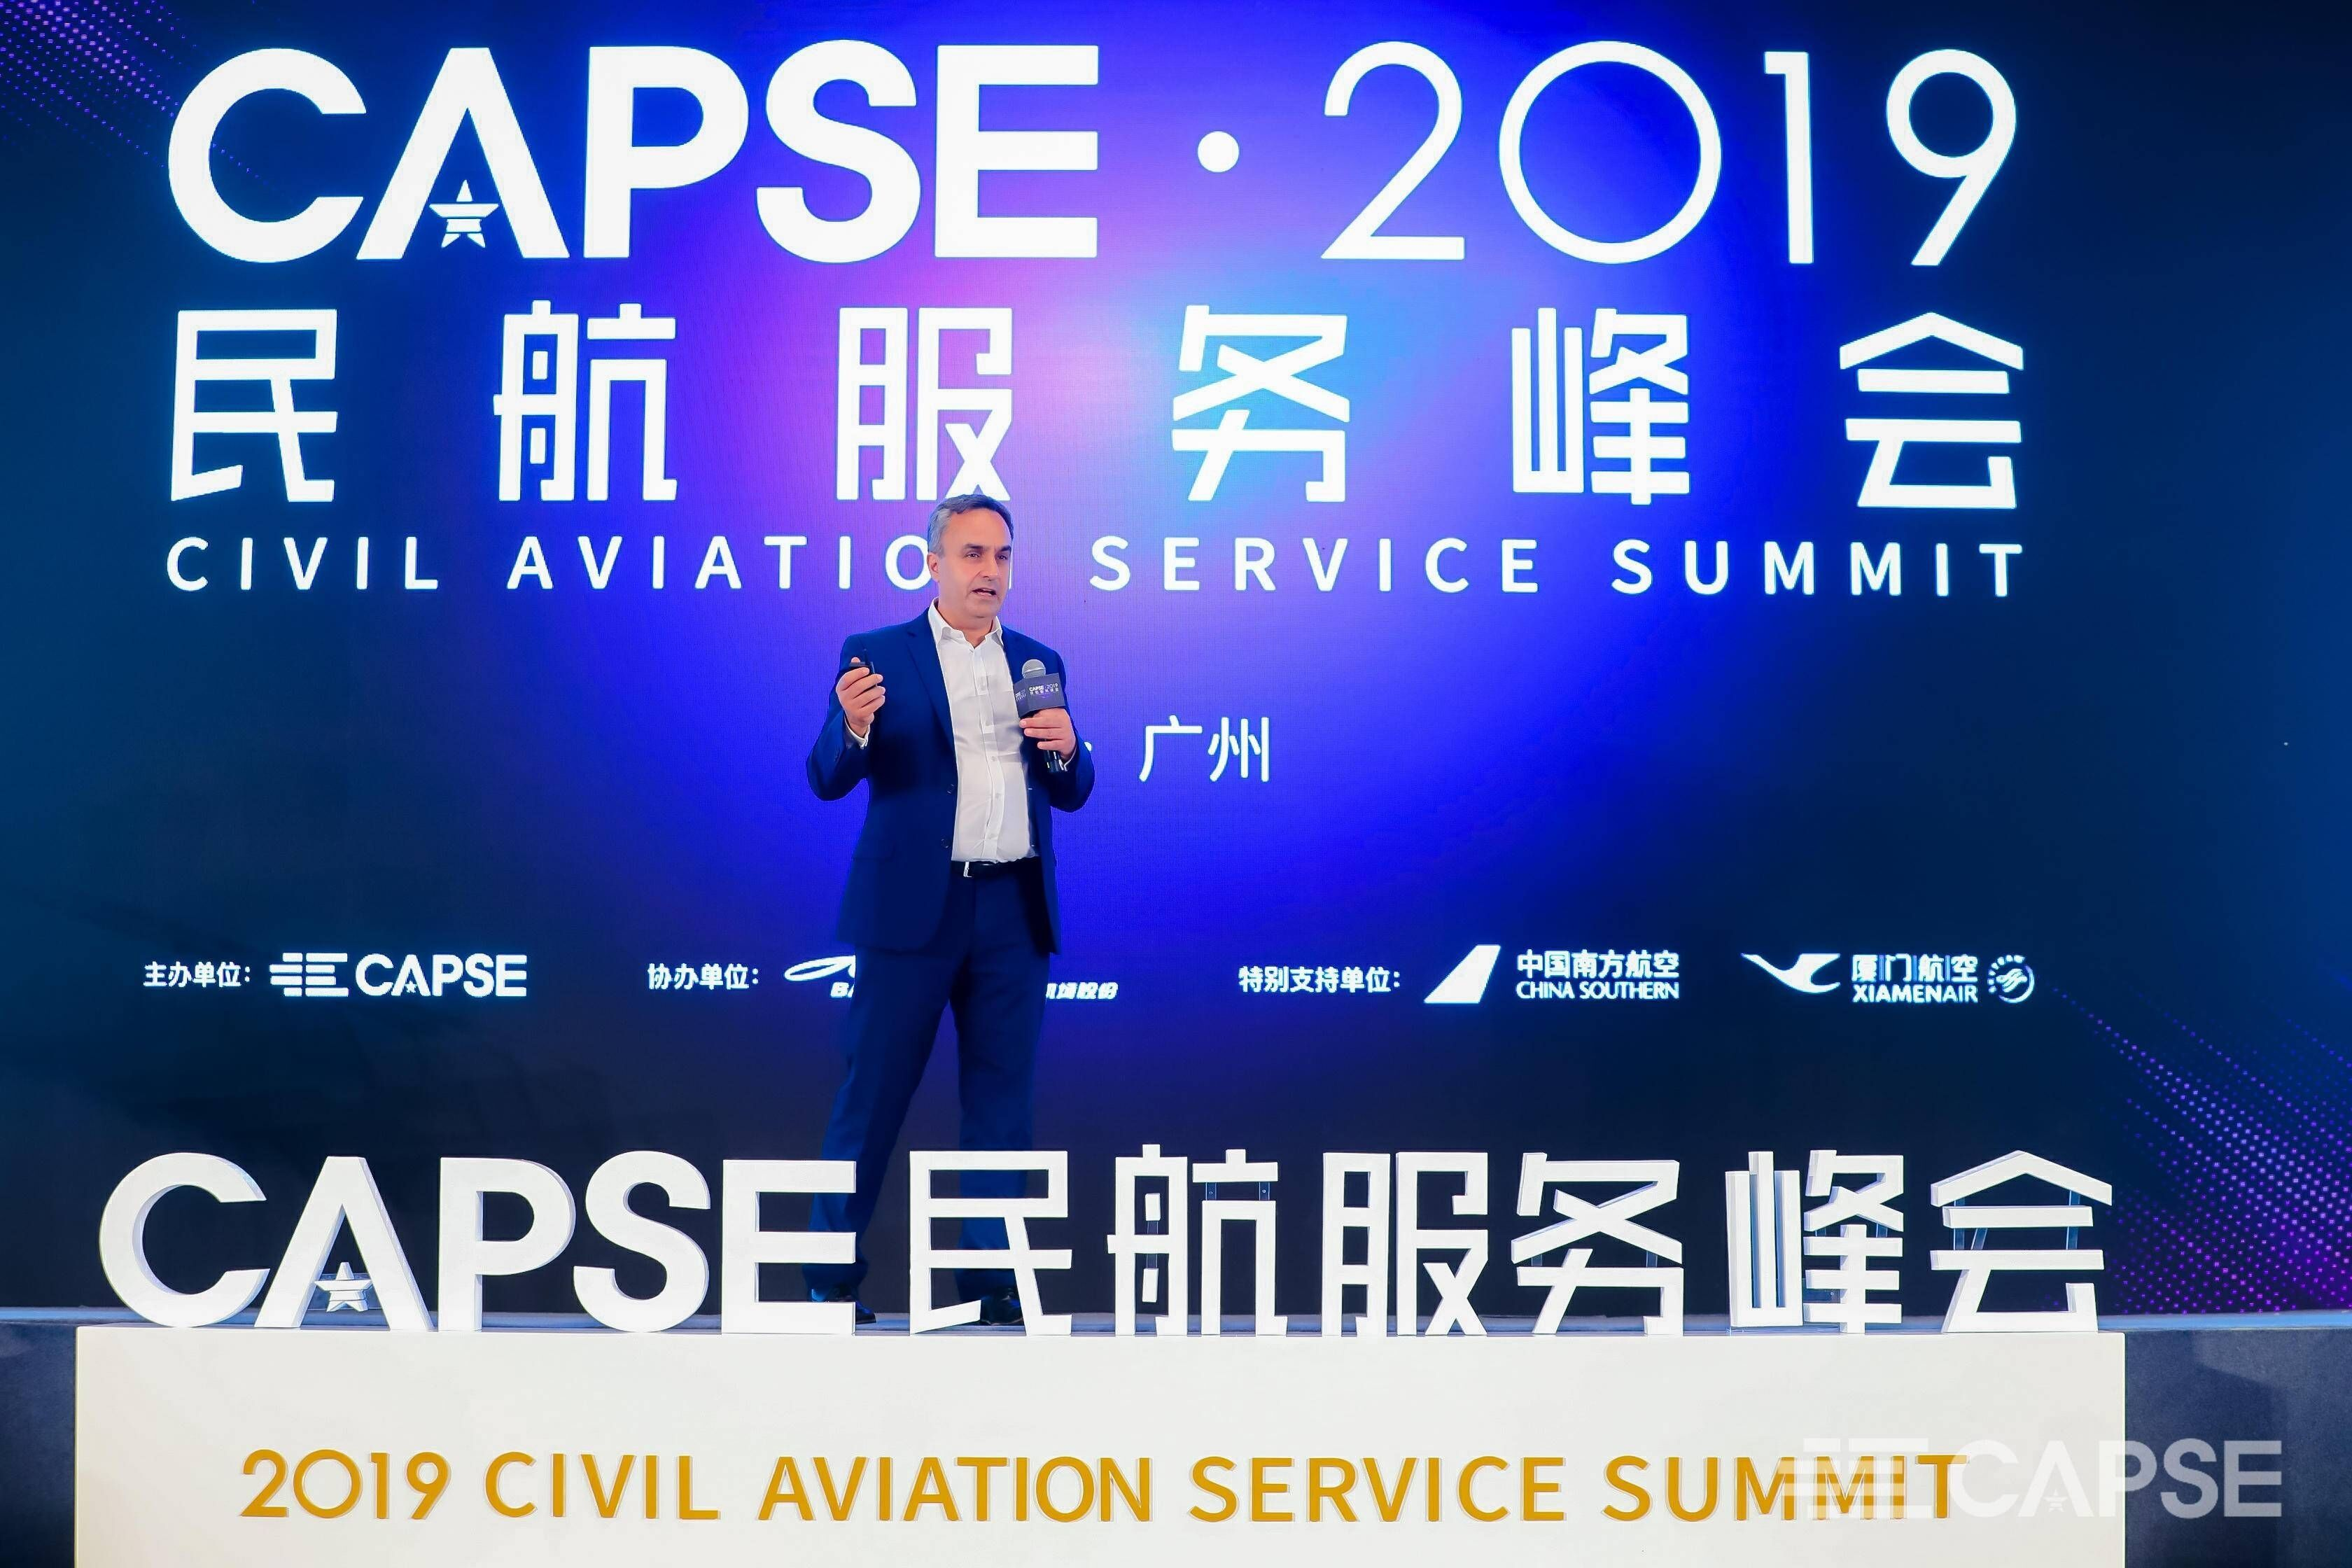 CAPSE民航服务峰会 未来机场